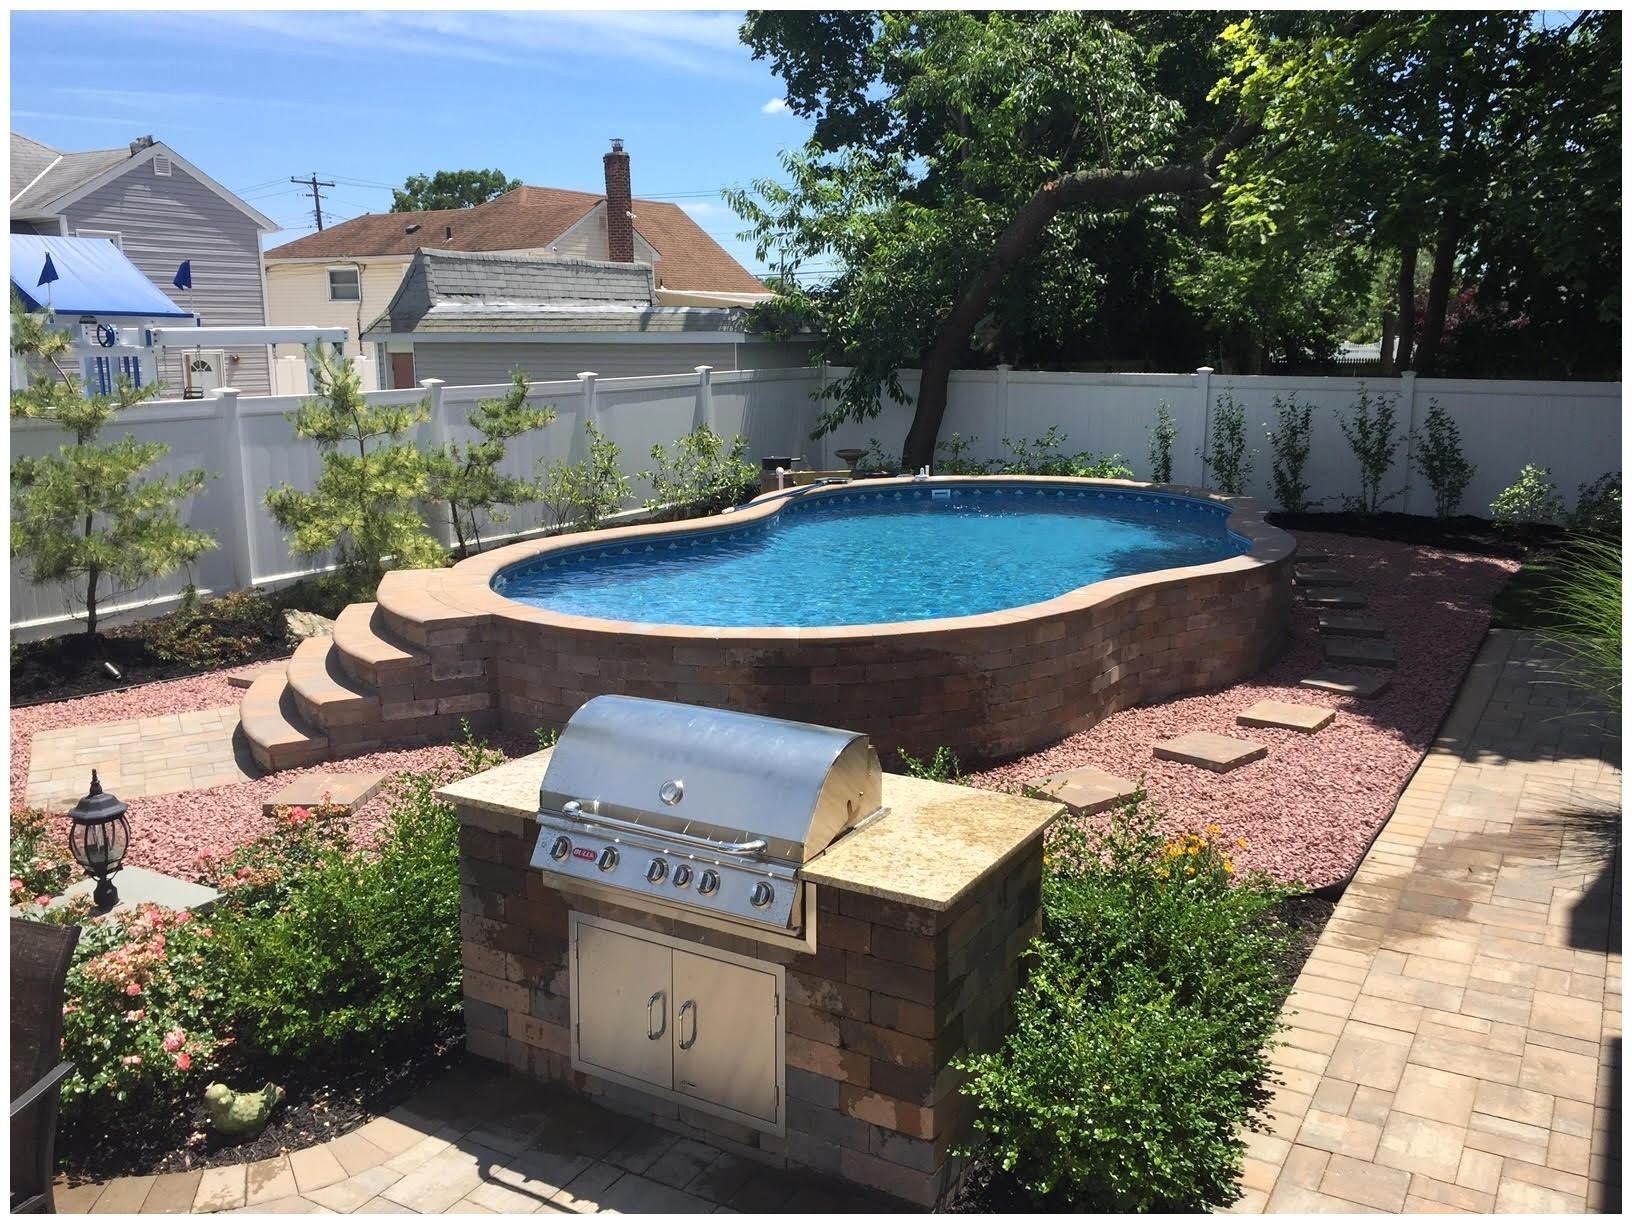 Trend Semi Inground Pool Kits — Randolph Indoor and Outdoor Design